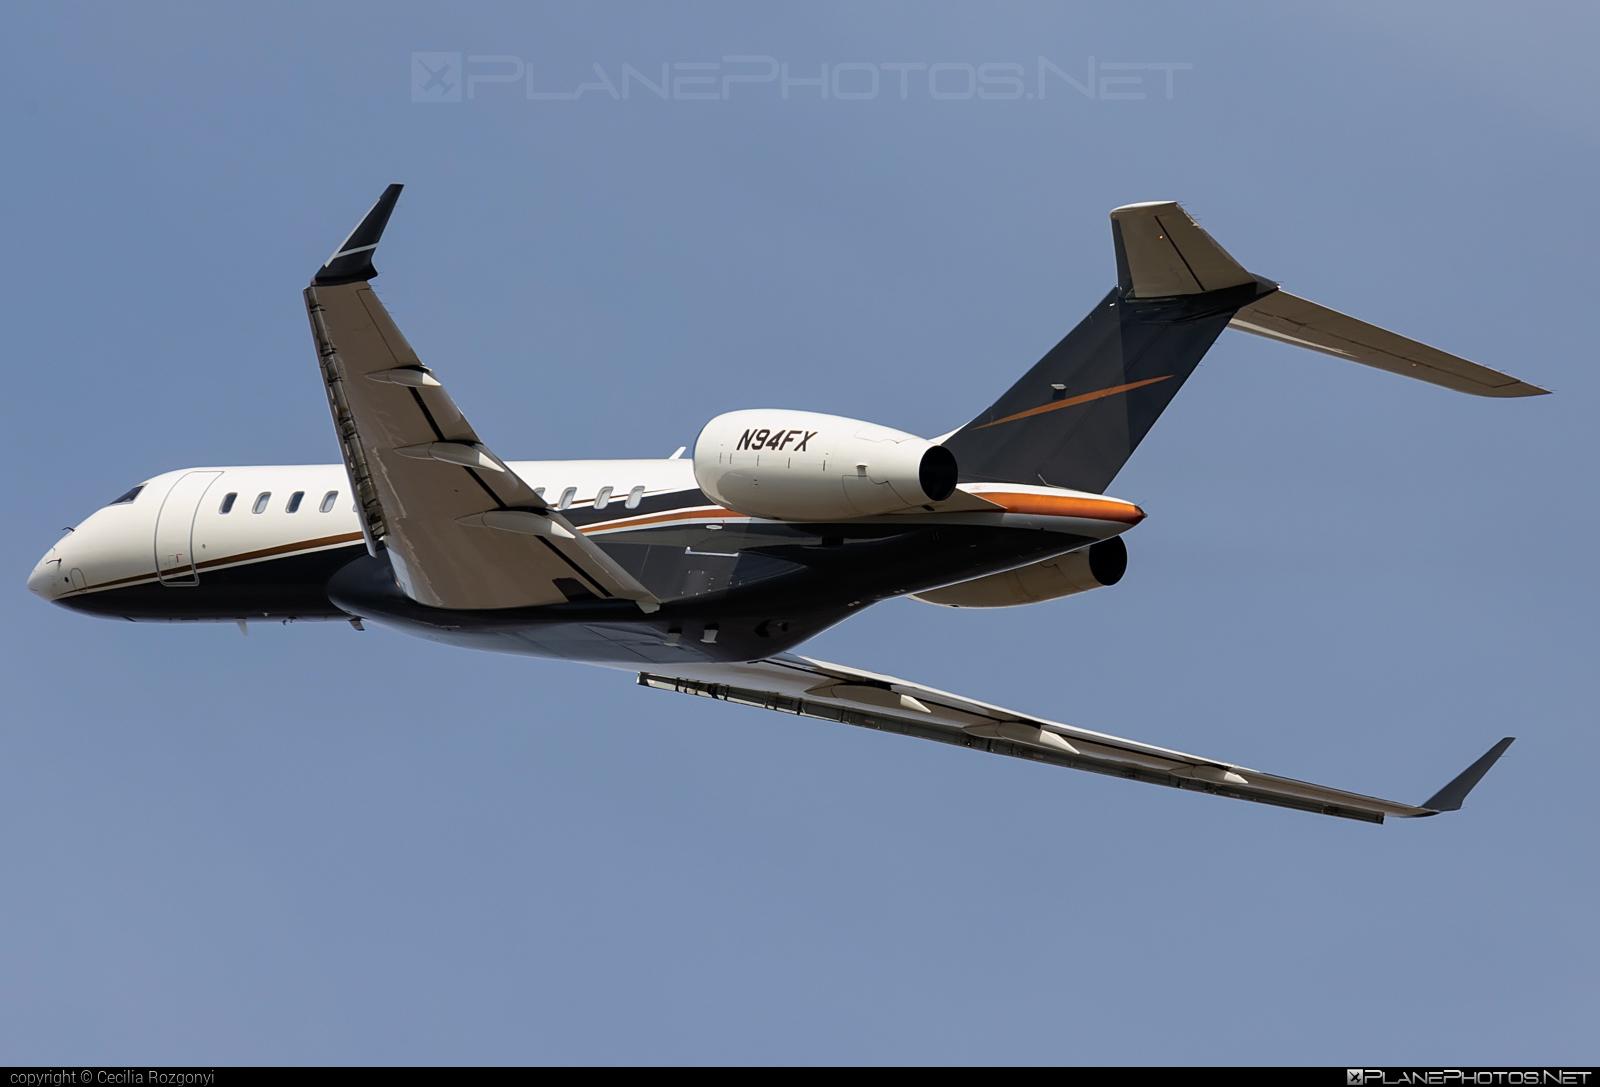 Bombardier Global Express XRS (BD-700-1A10) - N94FX operated by Flexjet #bd7001a10 #bombardier #bombardierglobalexpressxrs #flexjet #globalexpress #globalexpressxrs